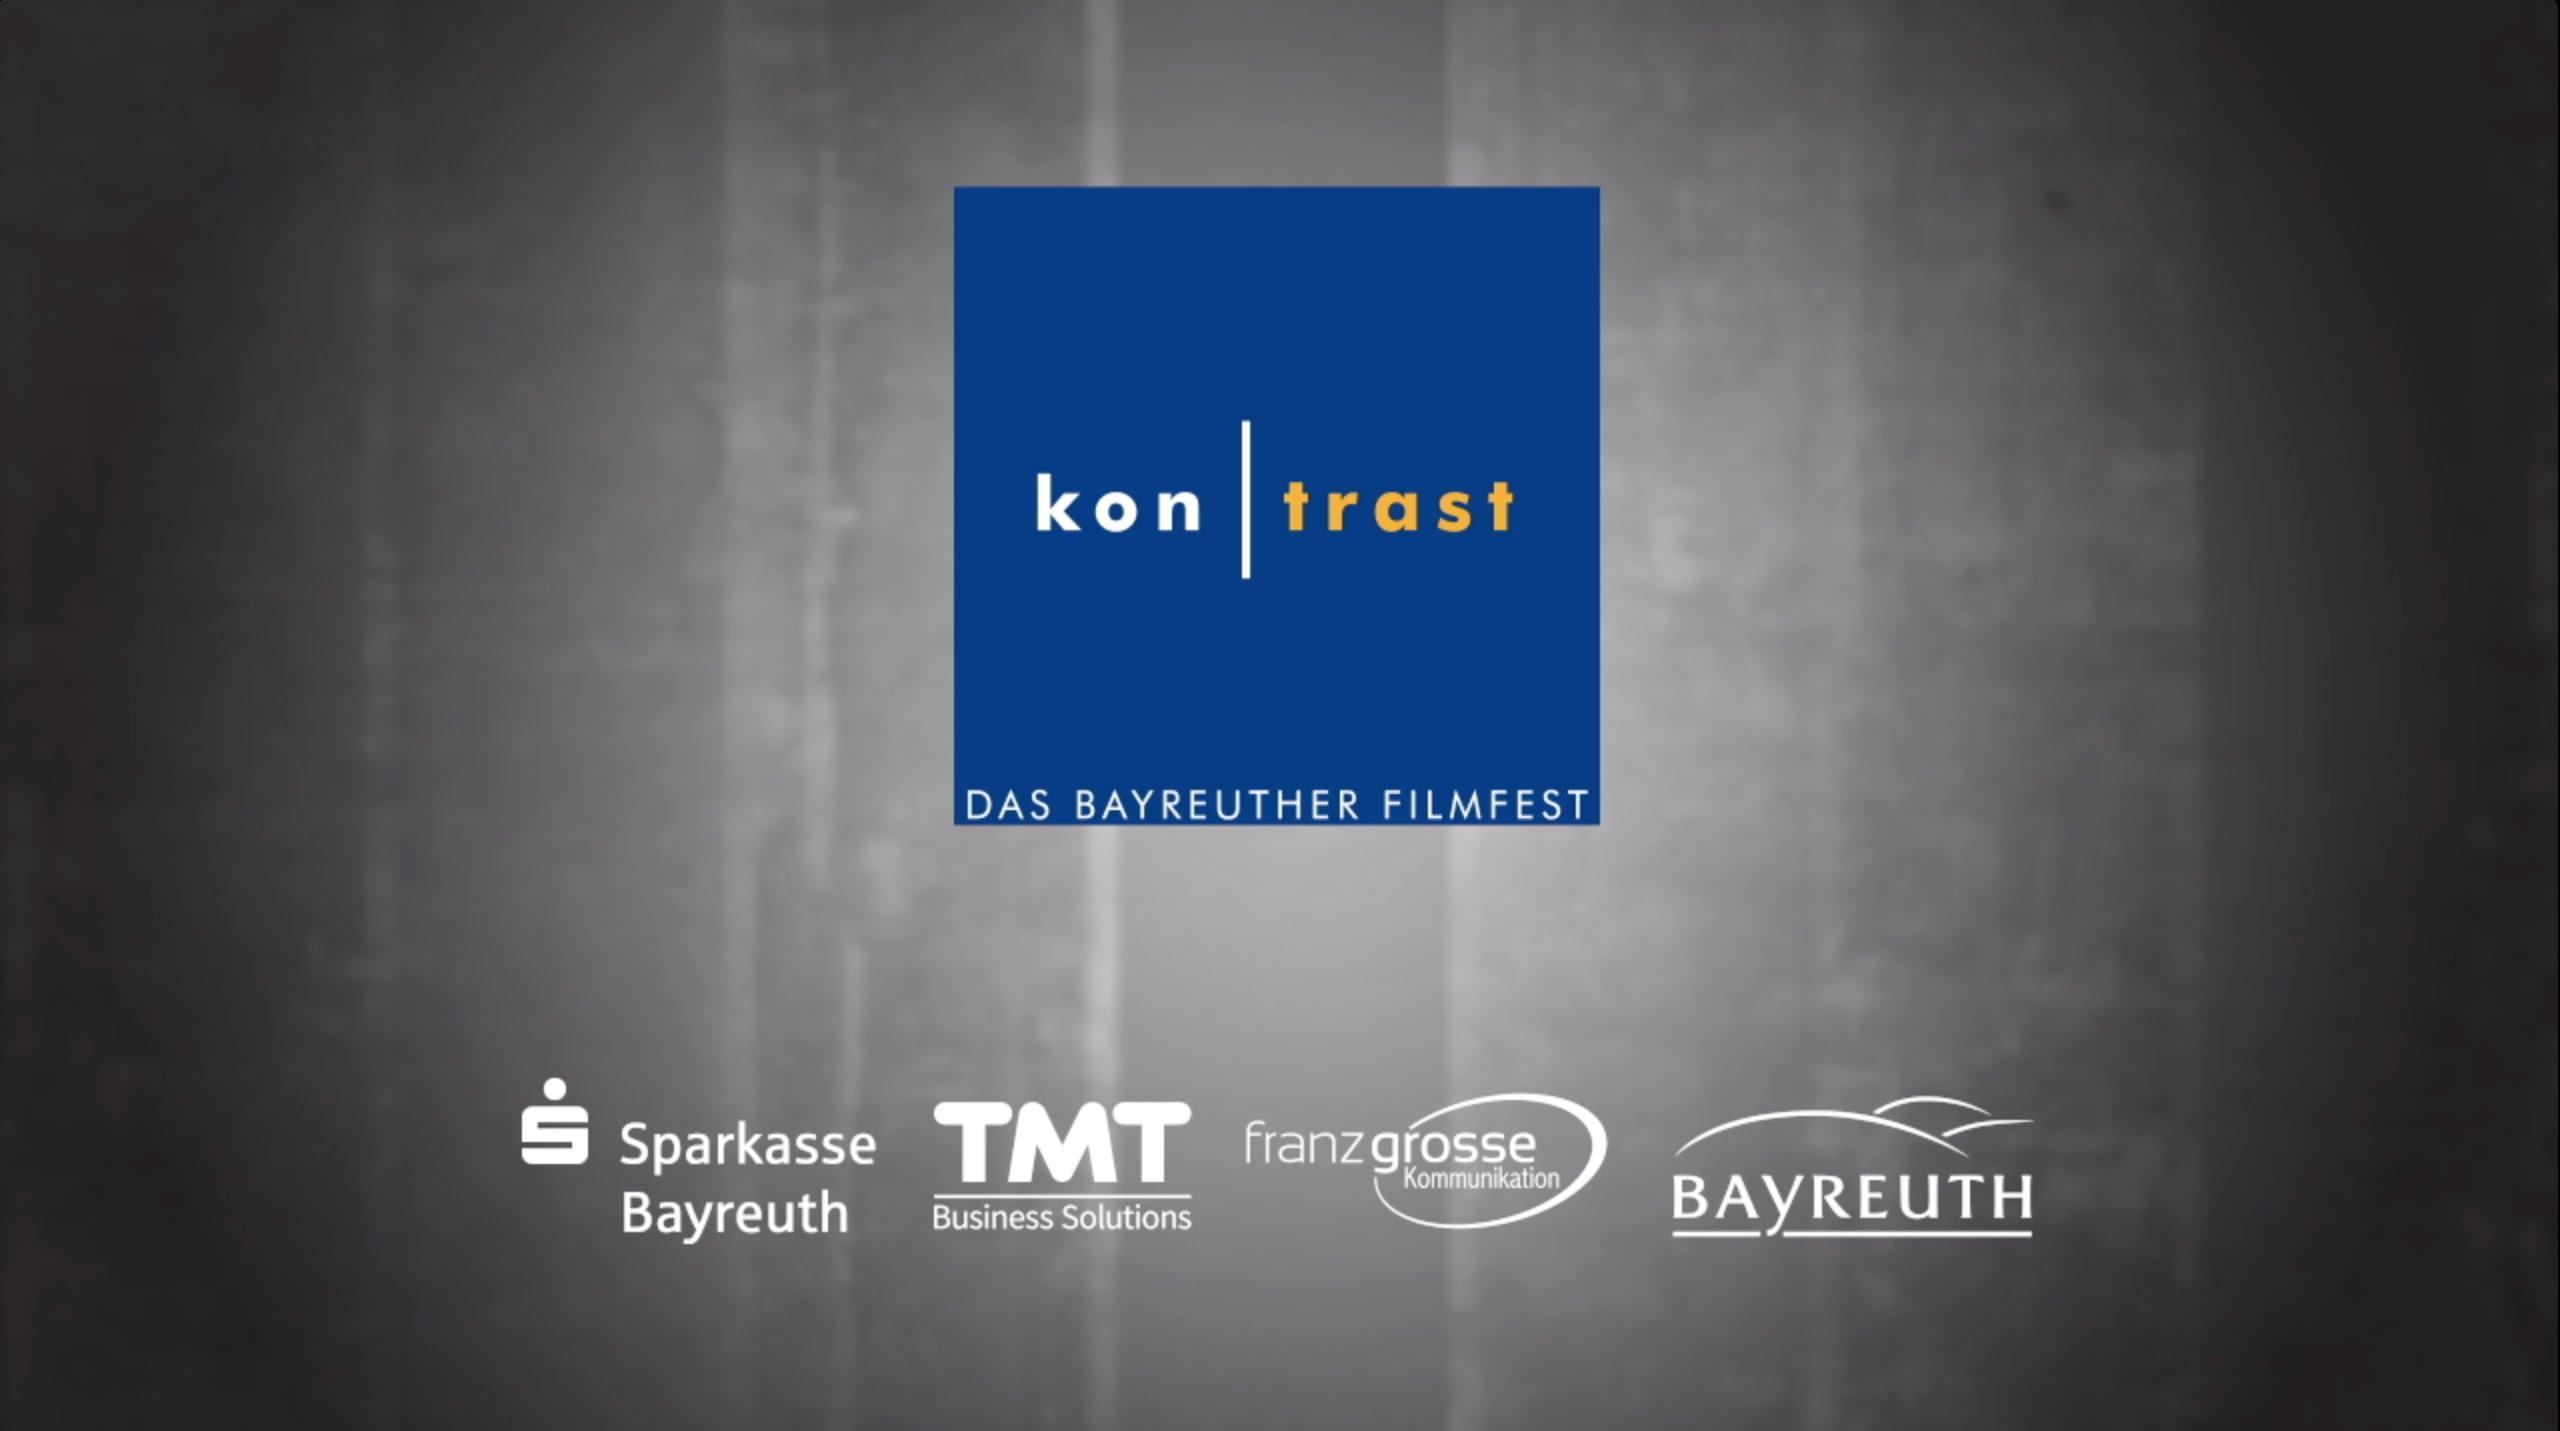 kontrast - Das Bayreuther Filmfest 2016 – Trailer